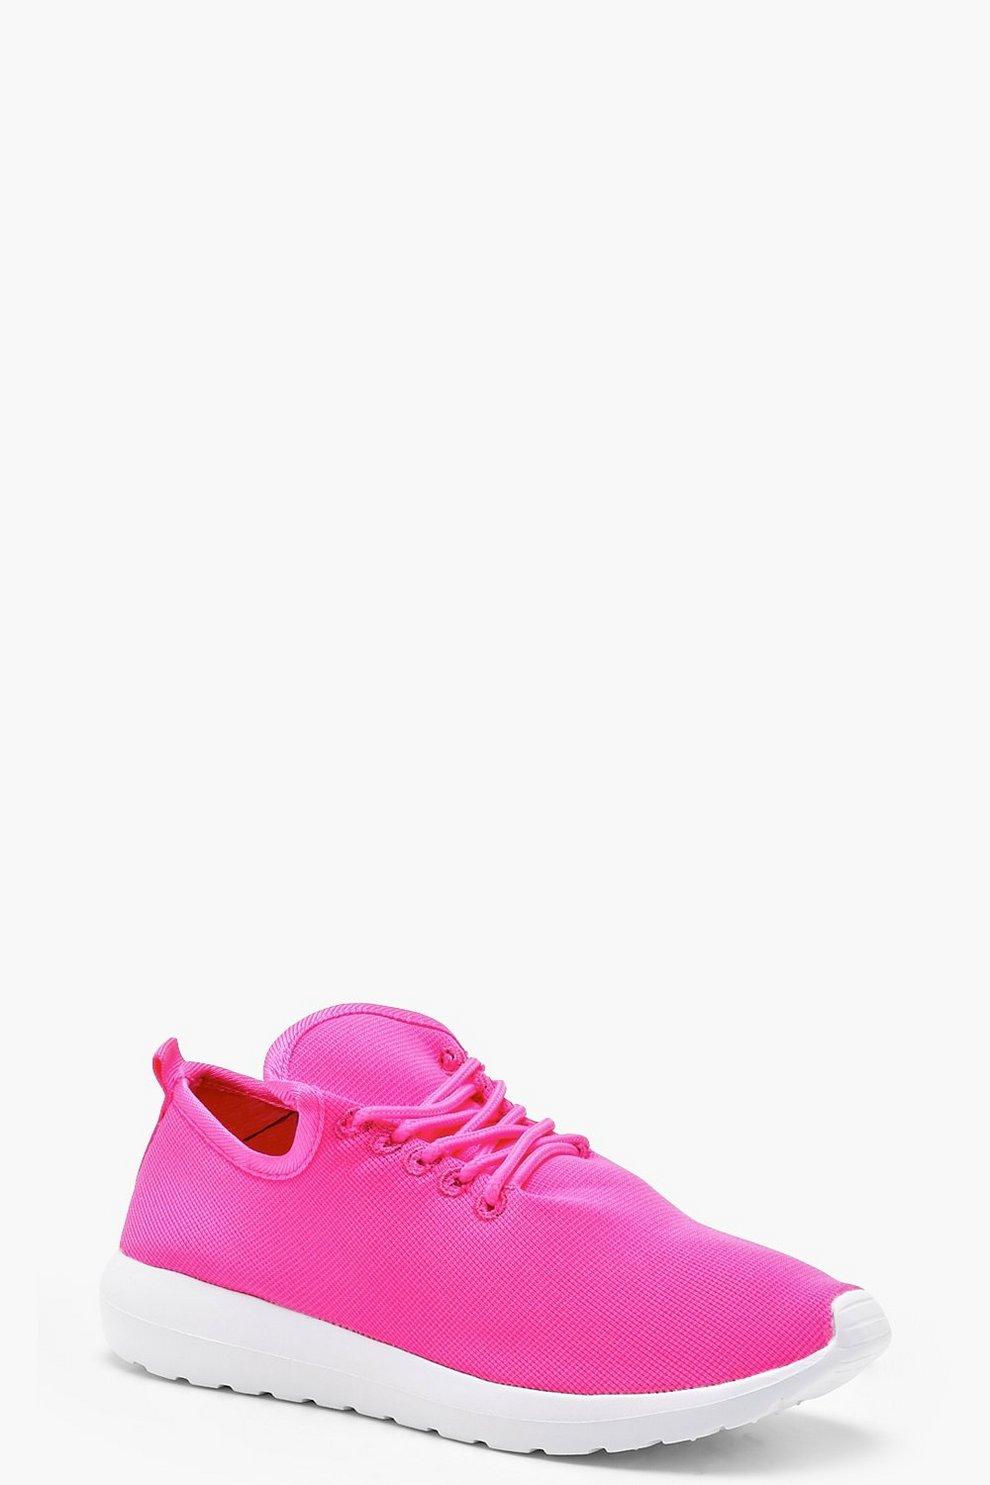 Aclaramiento De Compra Colorido Flexi allacciato scarpe da ginnastica sportive Compras Para El Precio Barato Salida 100% Garantizado hxxkL8GM